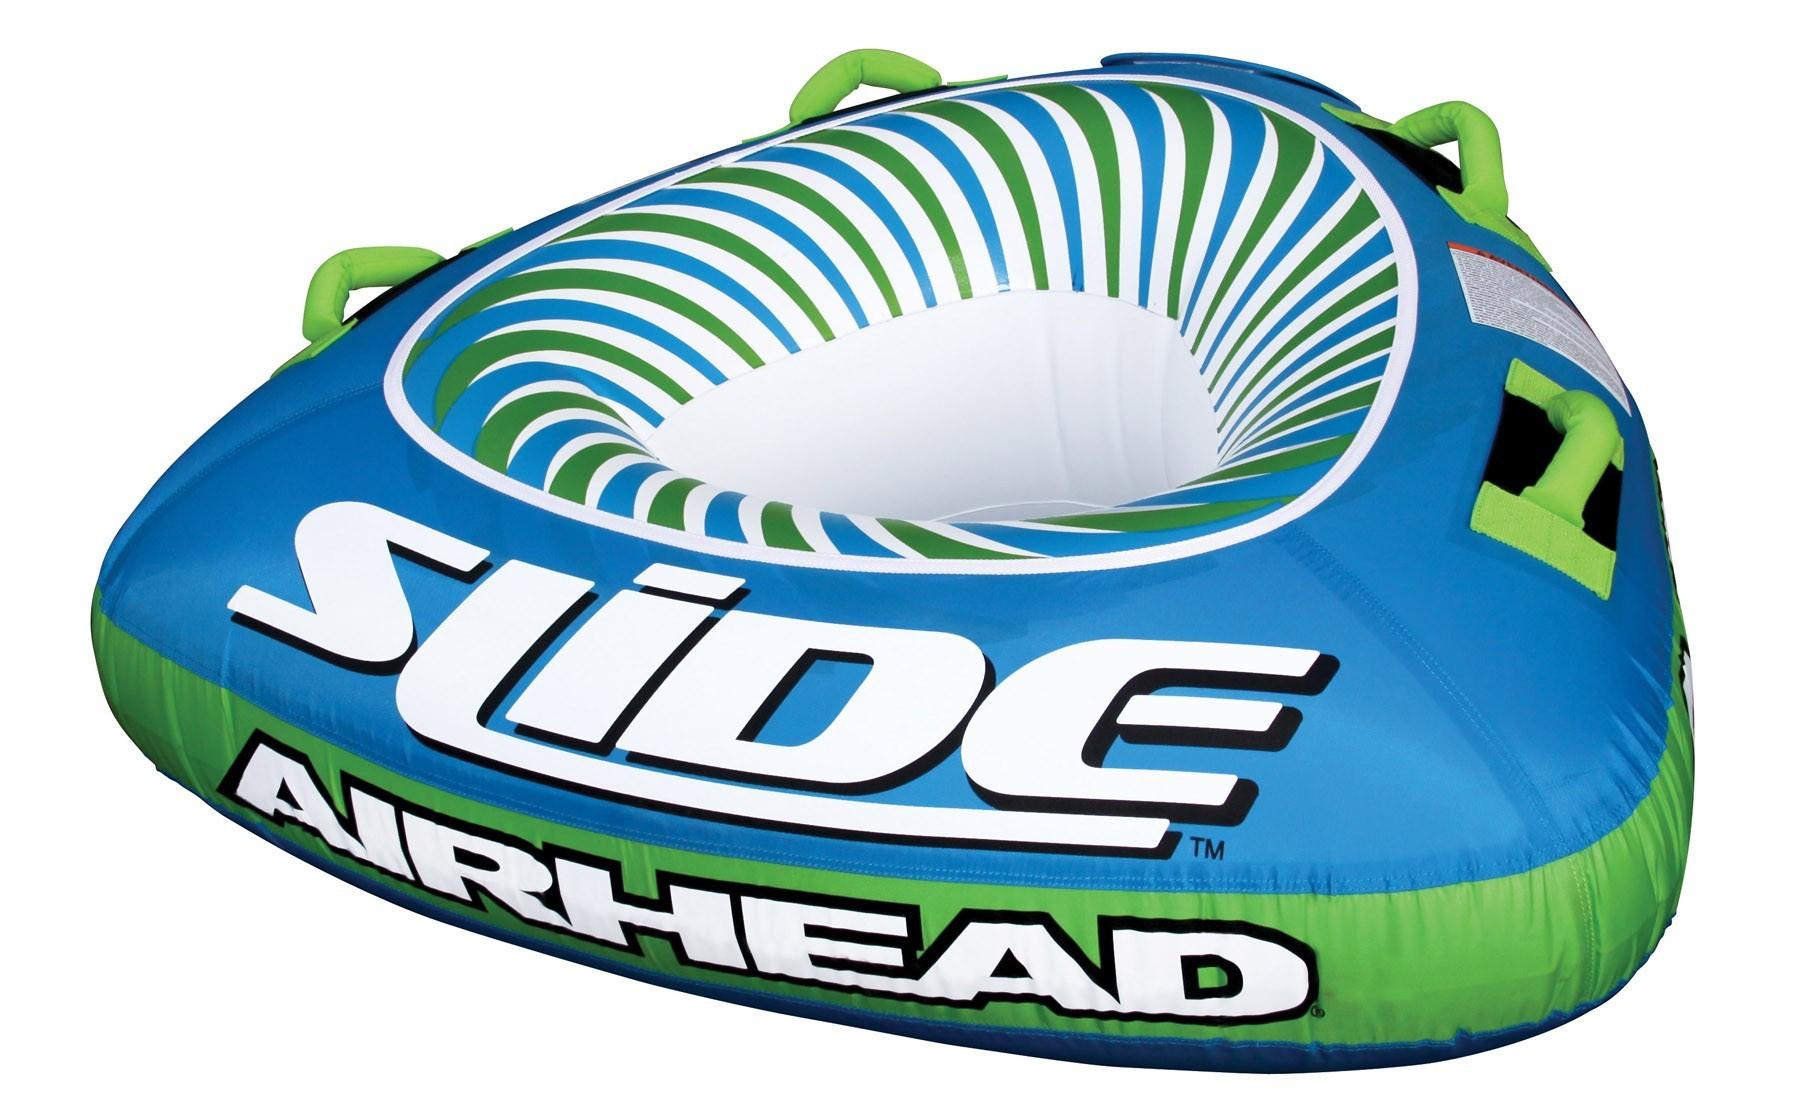 123.55 - SLIDE AIRHEAD